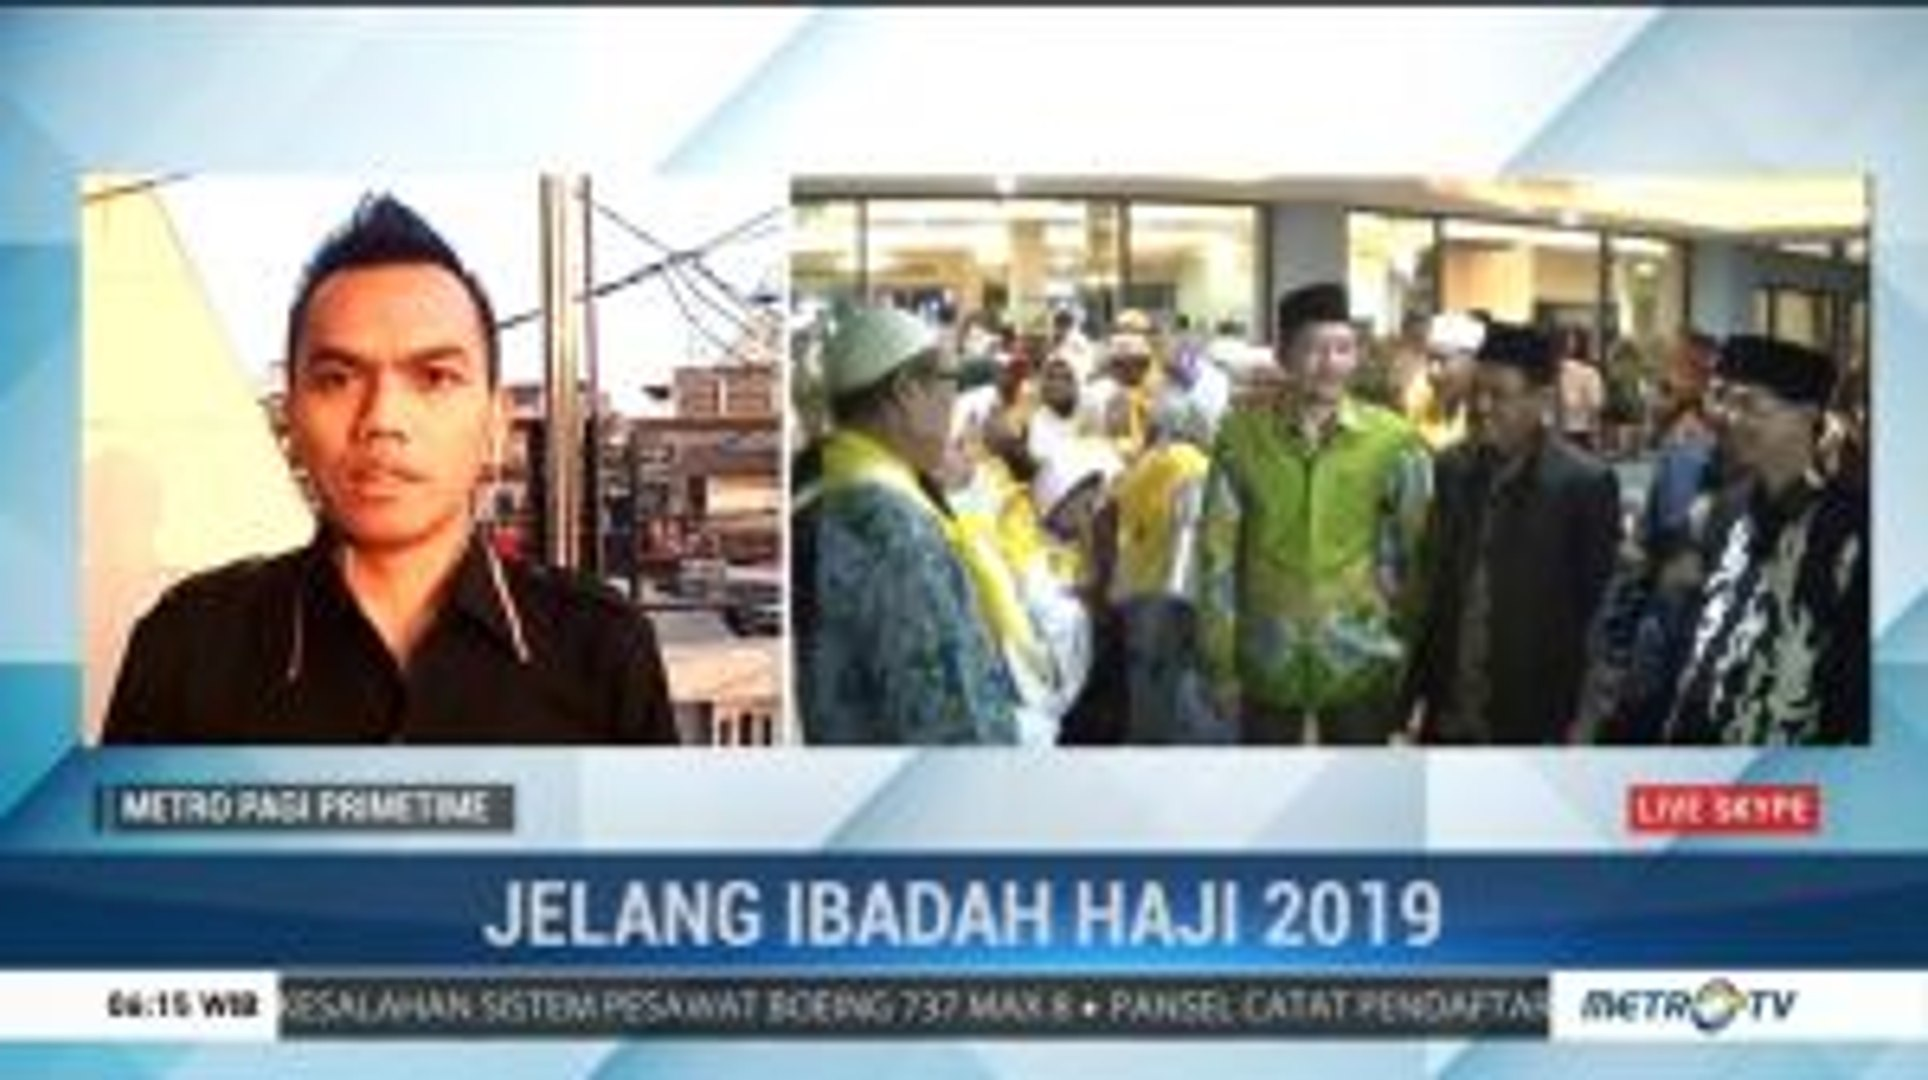 Hari Ini Jemaah Calhaj Embarkasi Surabaya Berangkat ke Tanah Suci